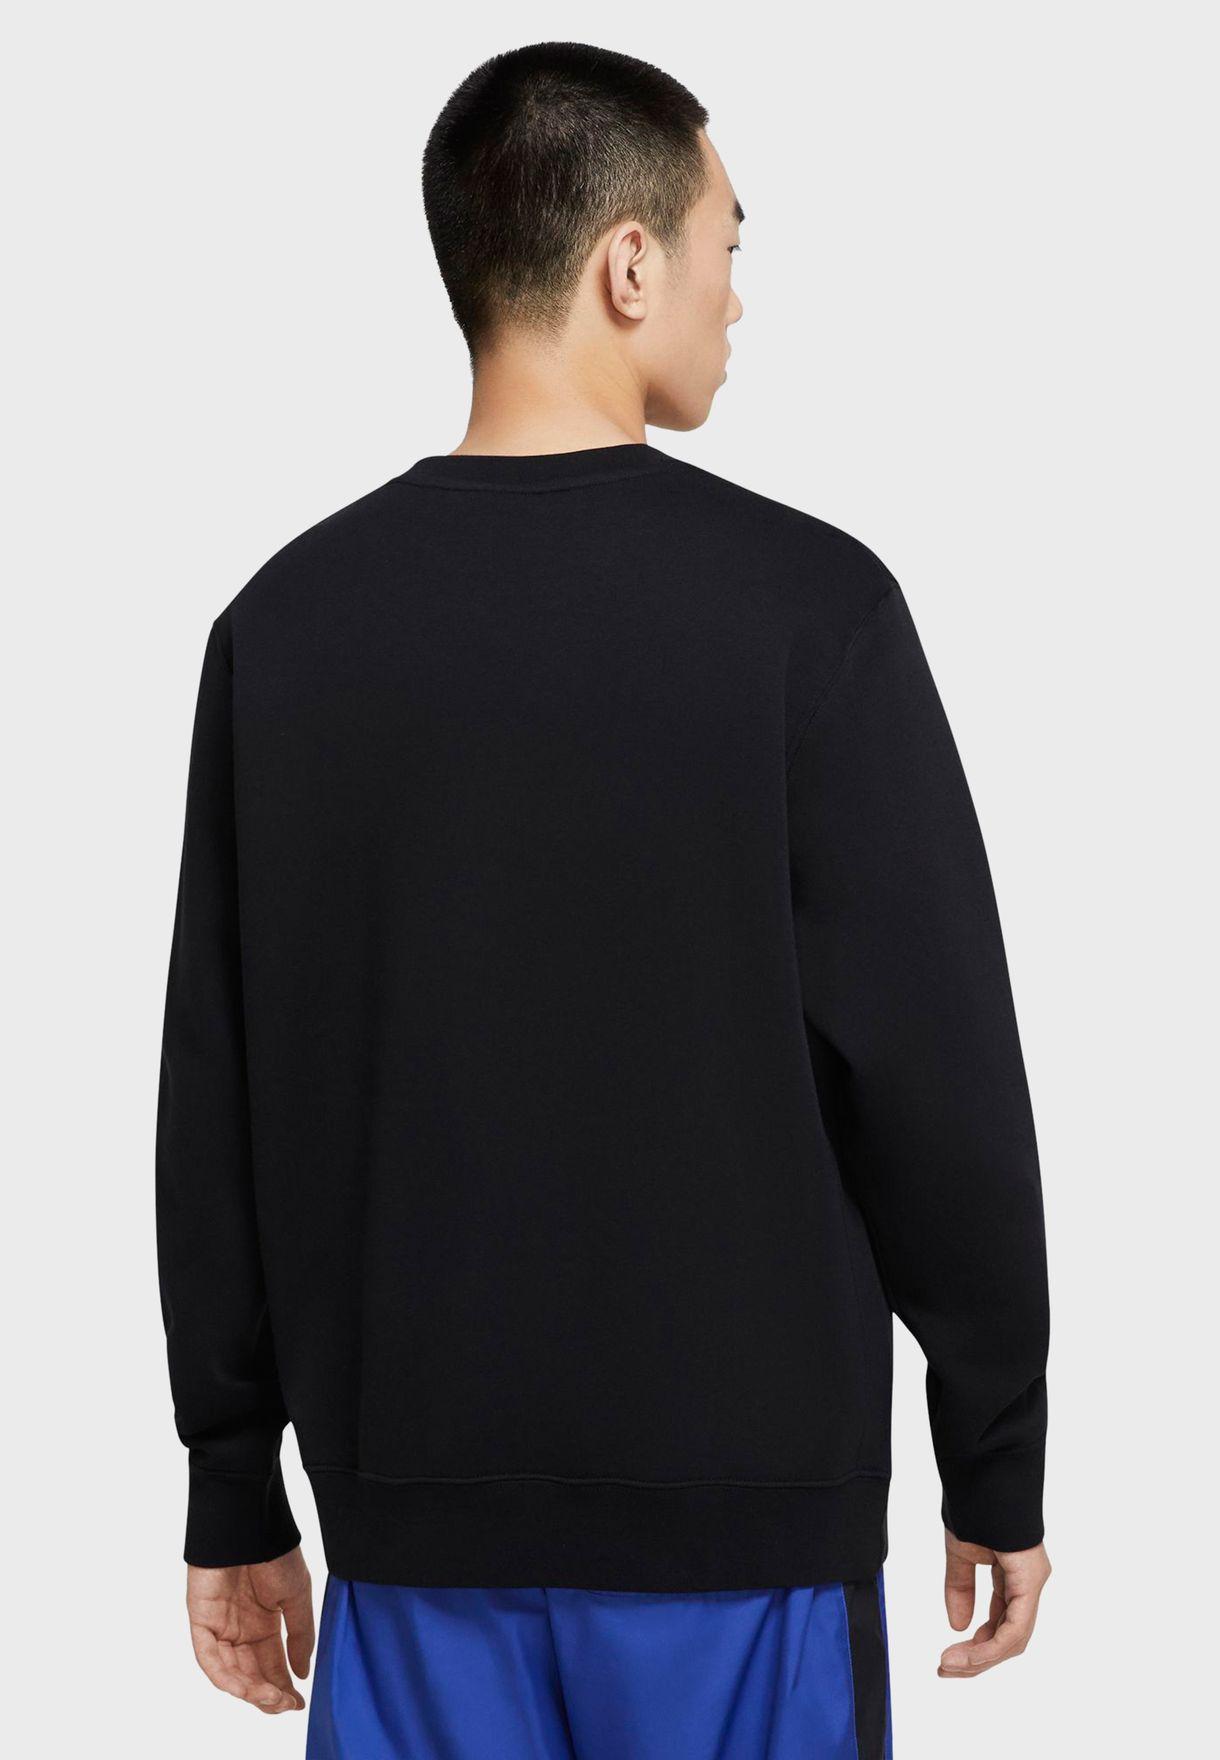 NSW Just Do It 365 Fleece Sweatshirt